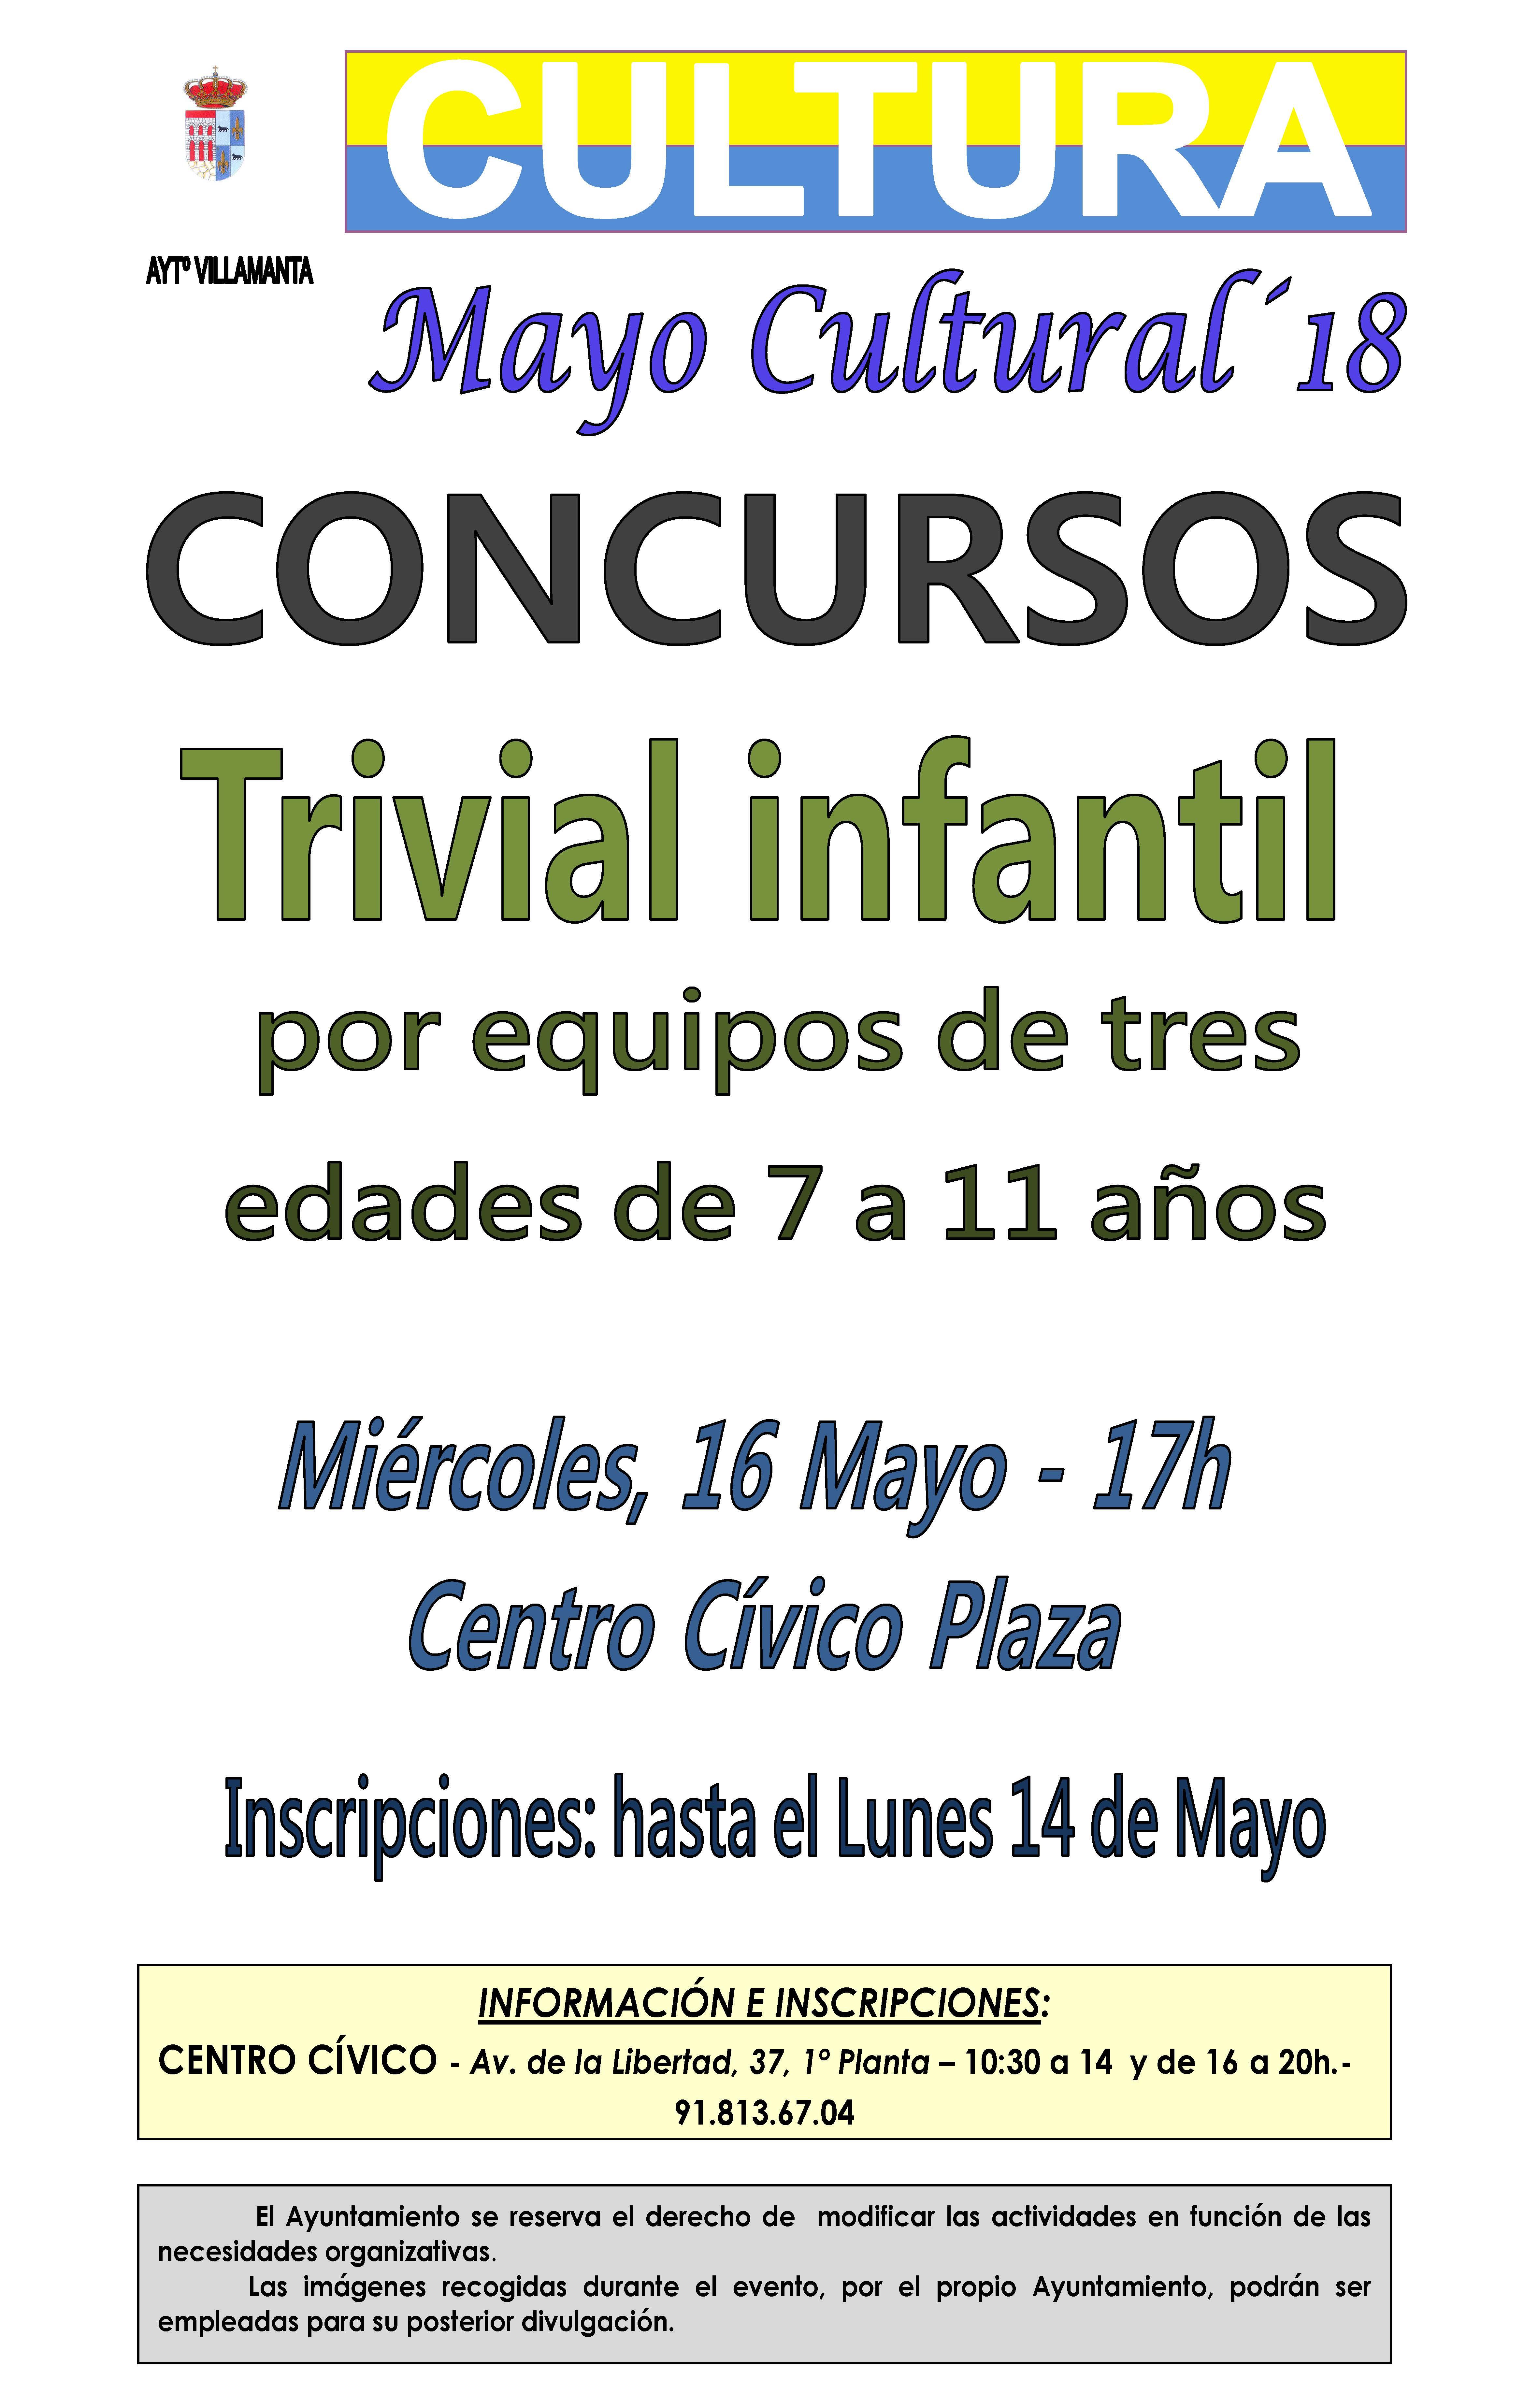 Concurso trivial infantil 16 de mayo